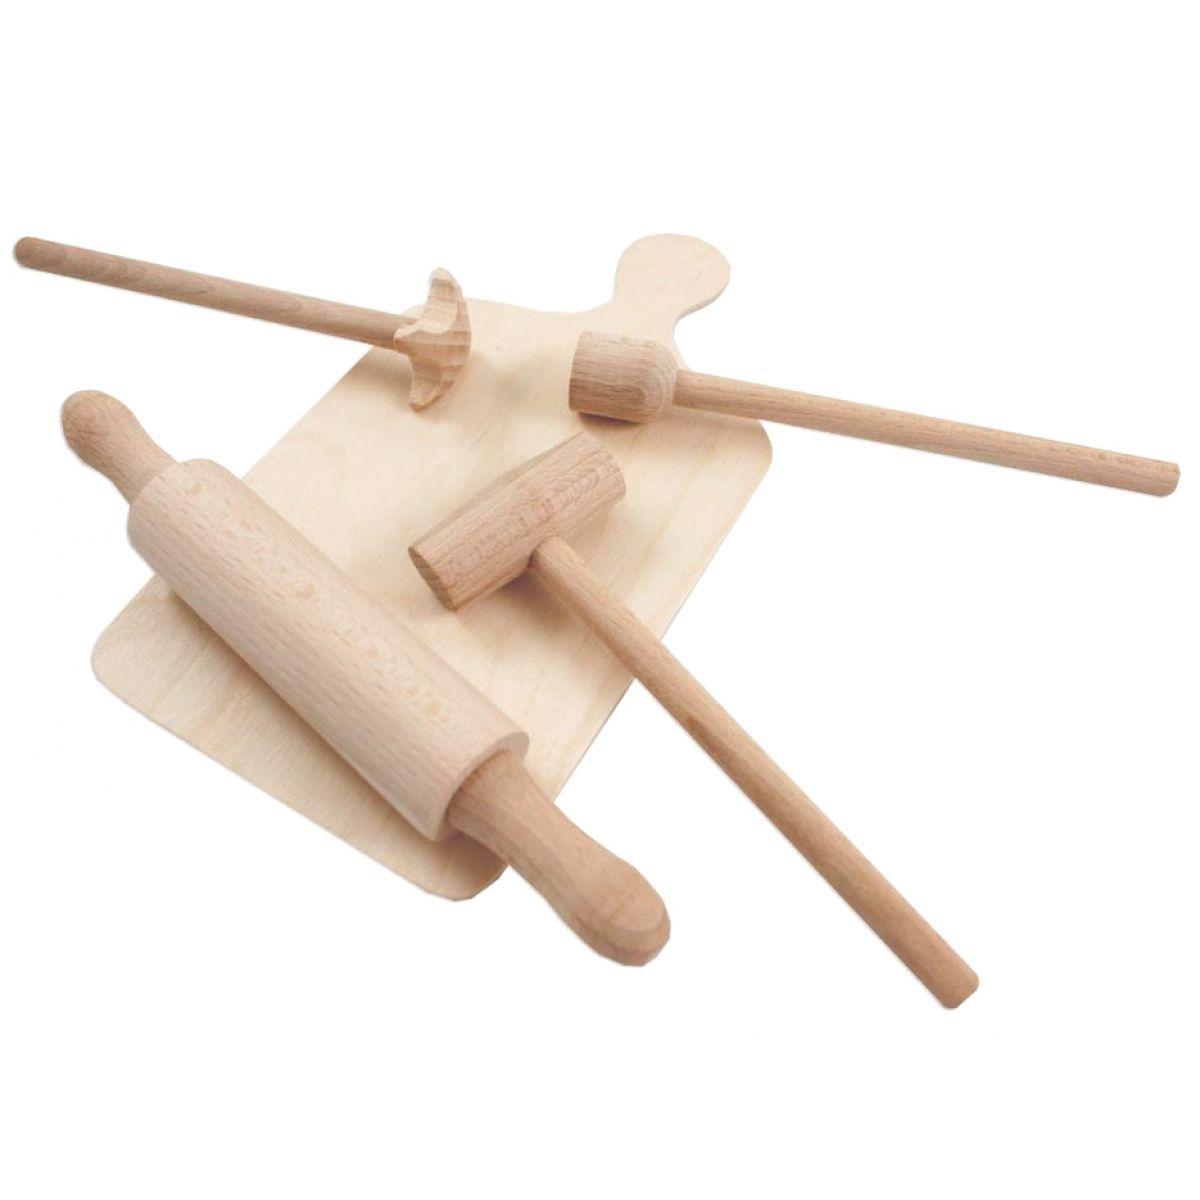 Dřevěná kuchyňská sada malá